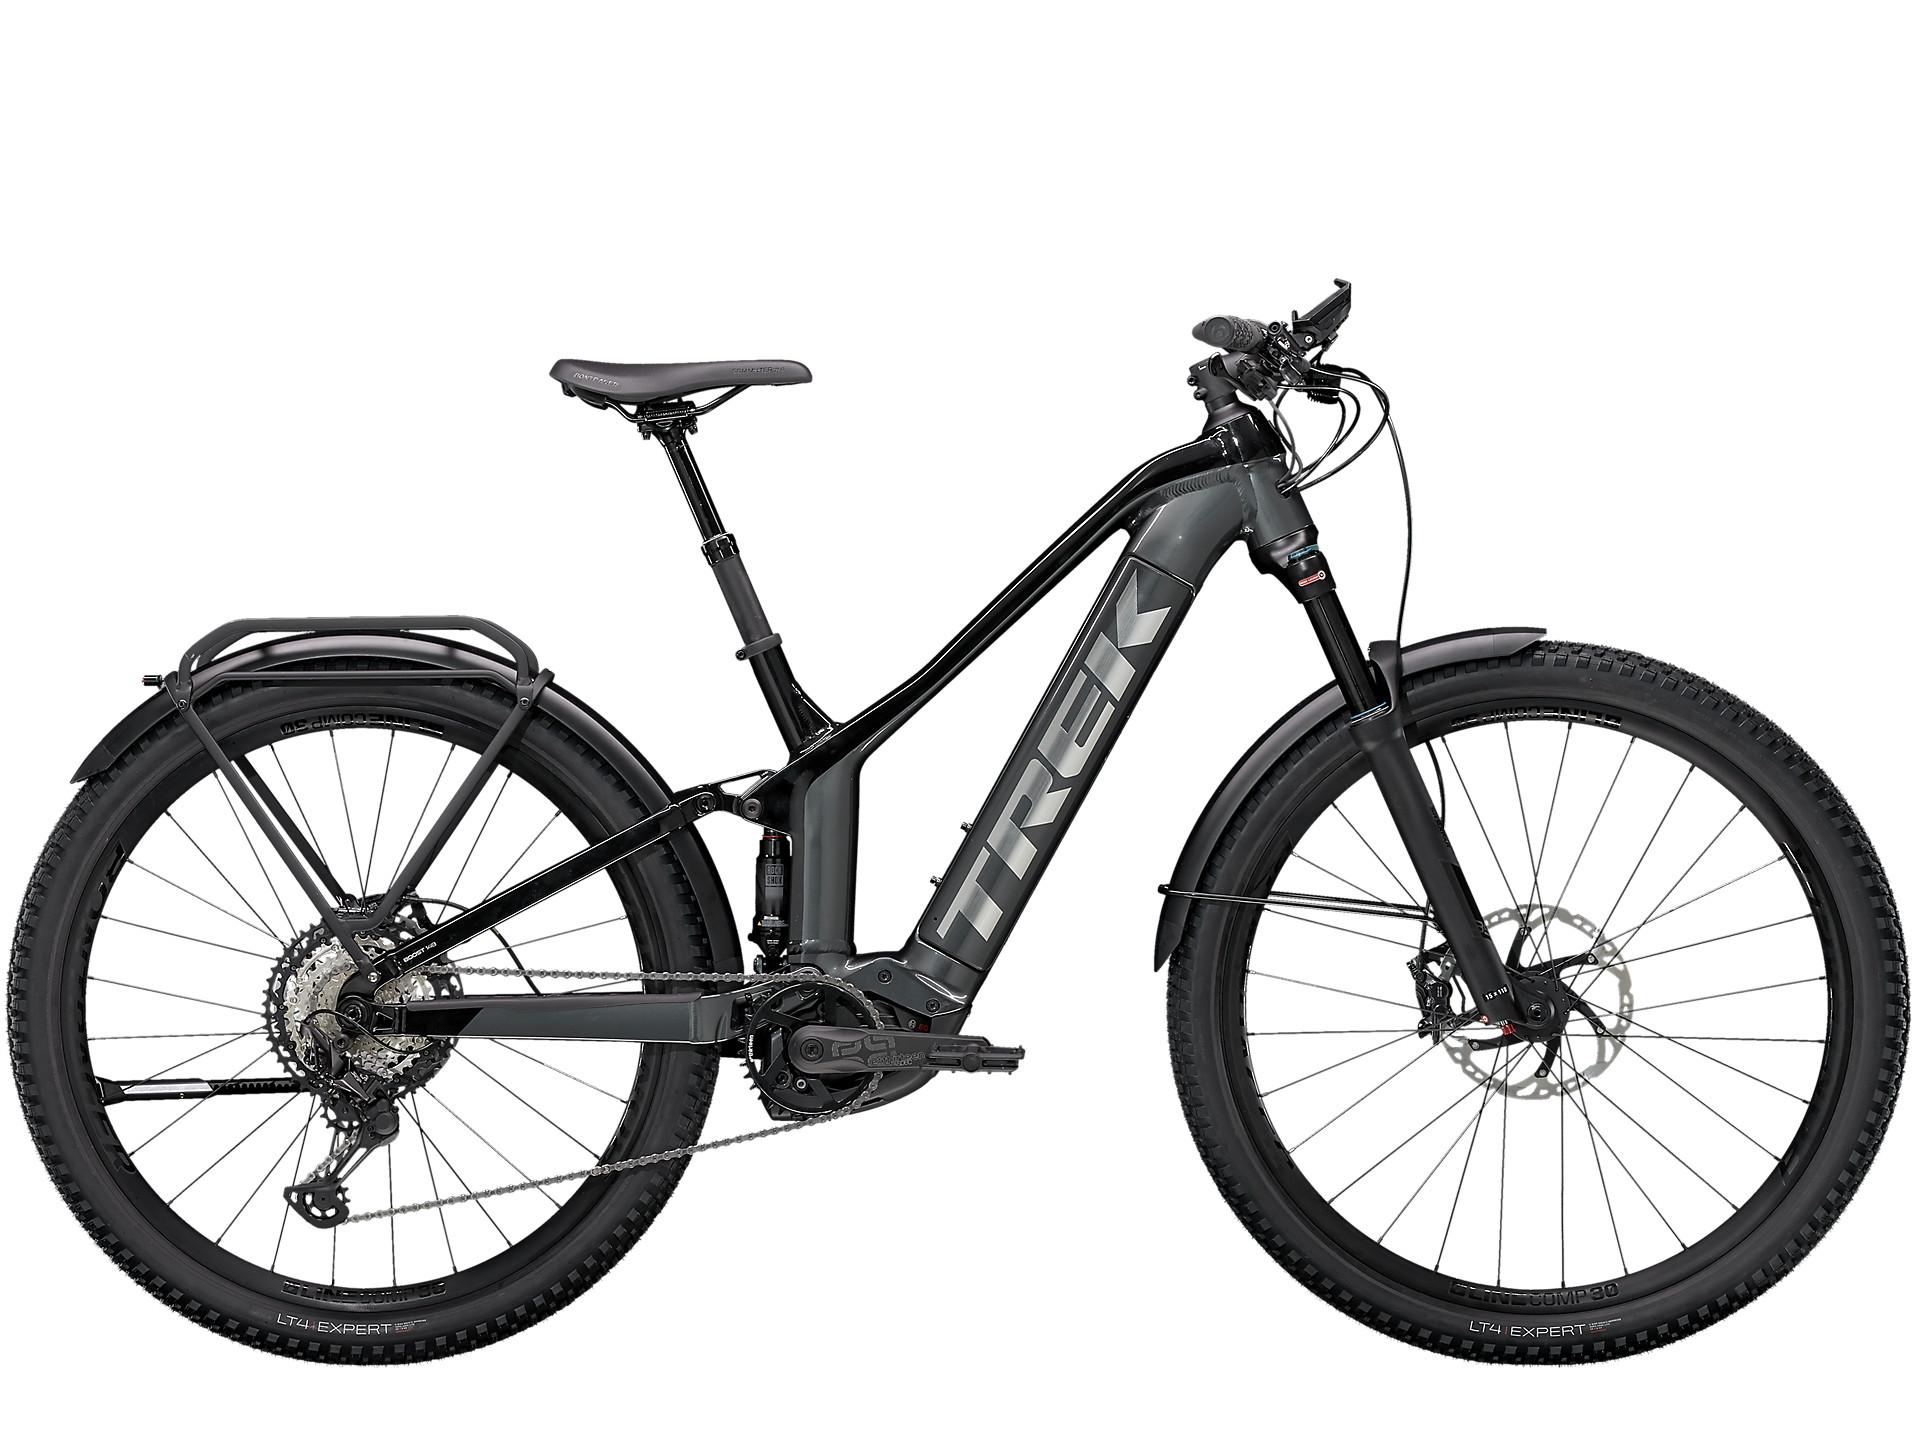 A full-suspension Trek electric bike for mountain touring